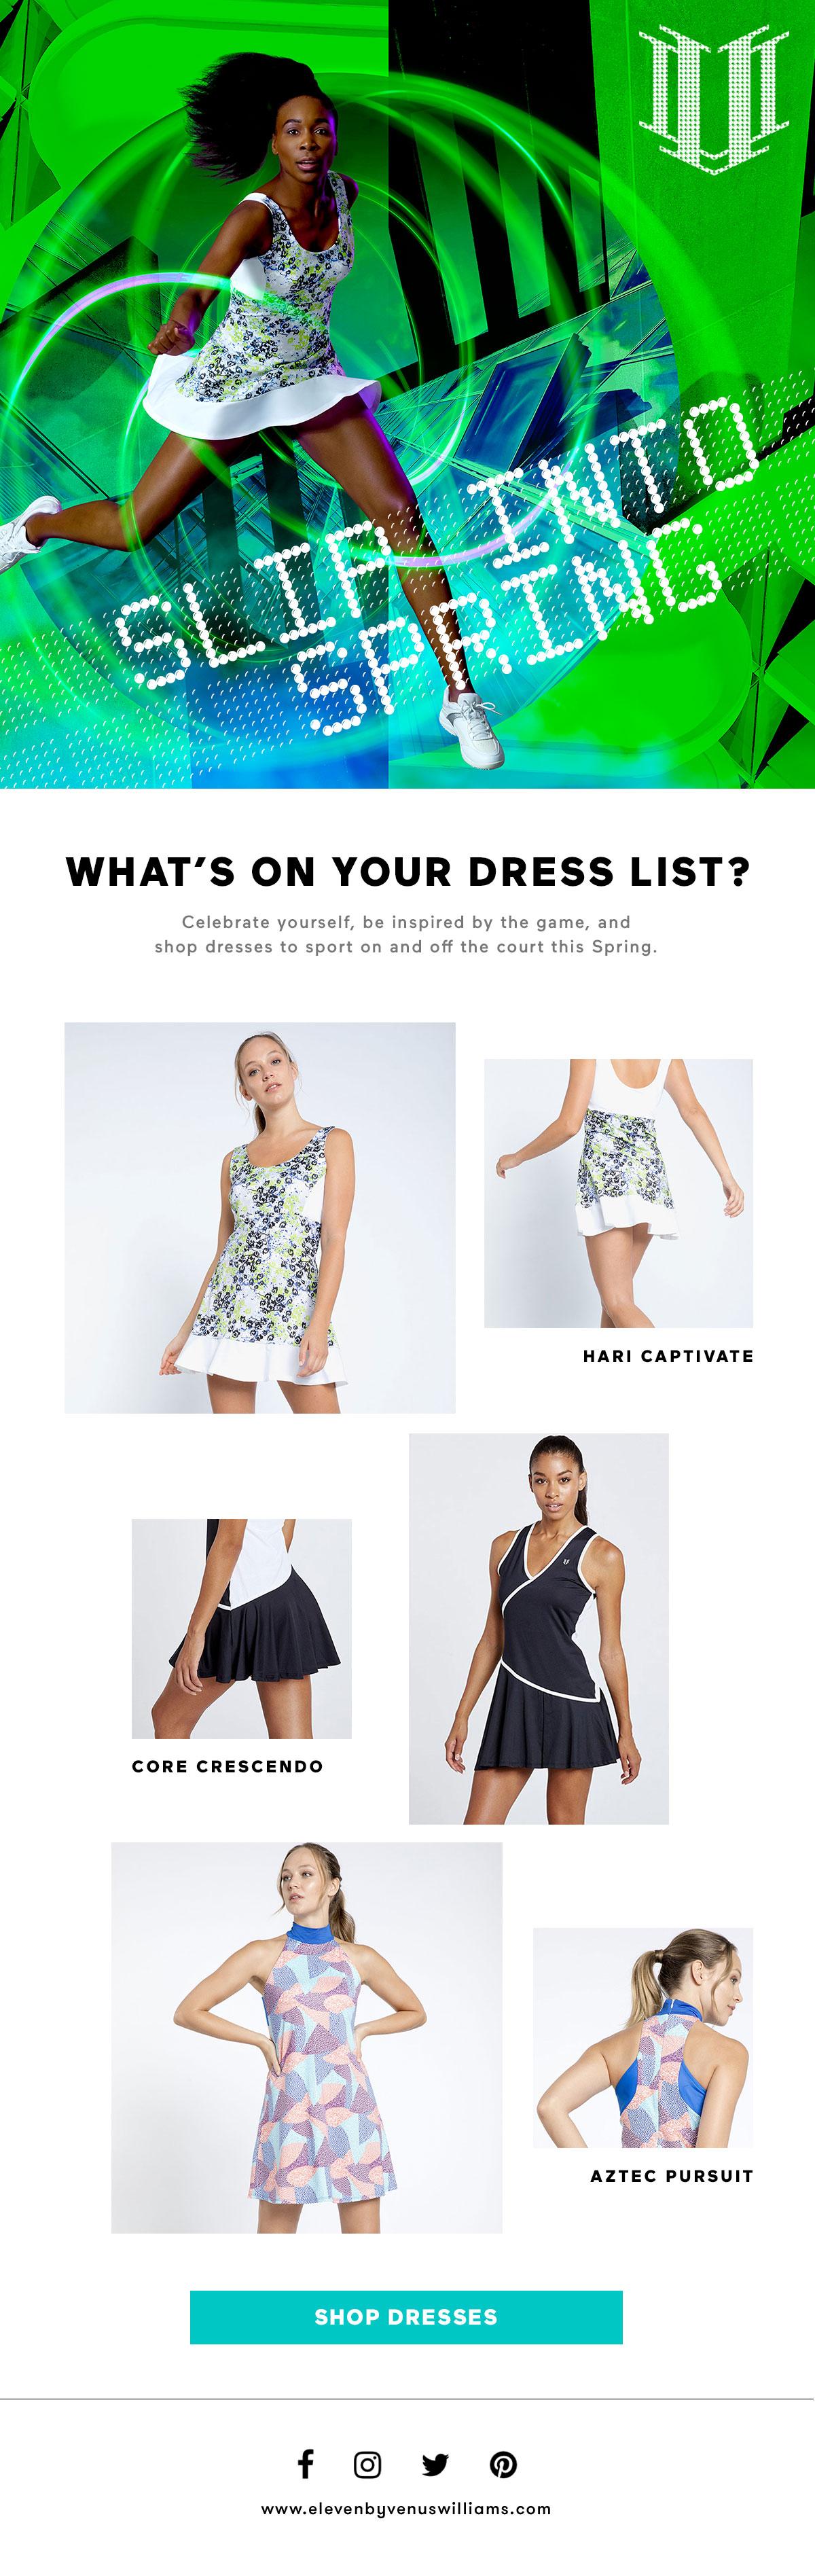 Tennis Dress Email Blast